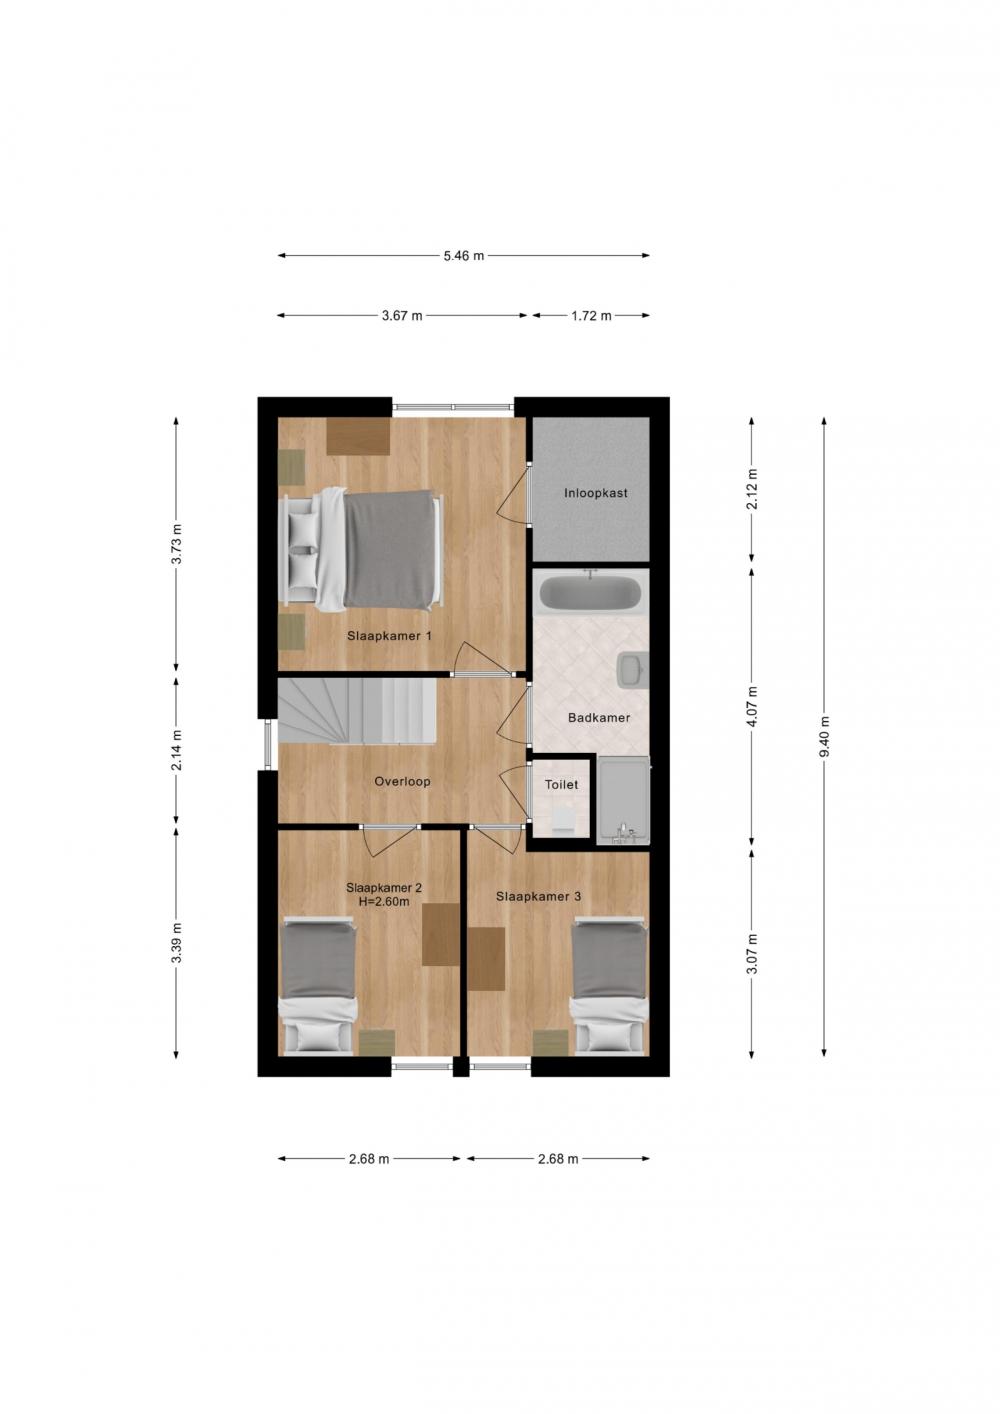 lochem-torenmolenlaan-19